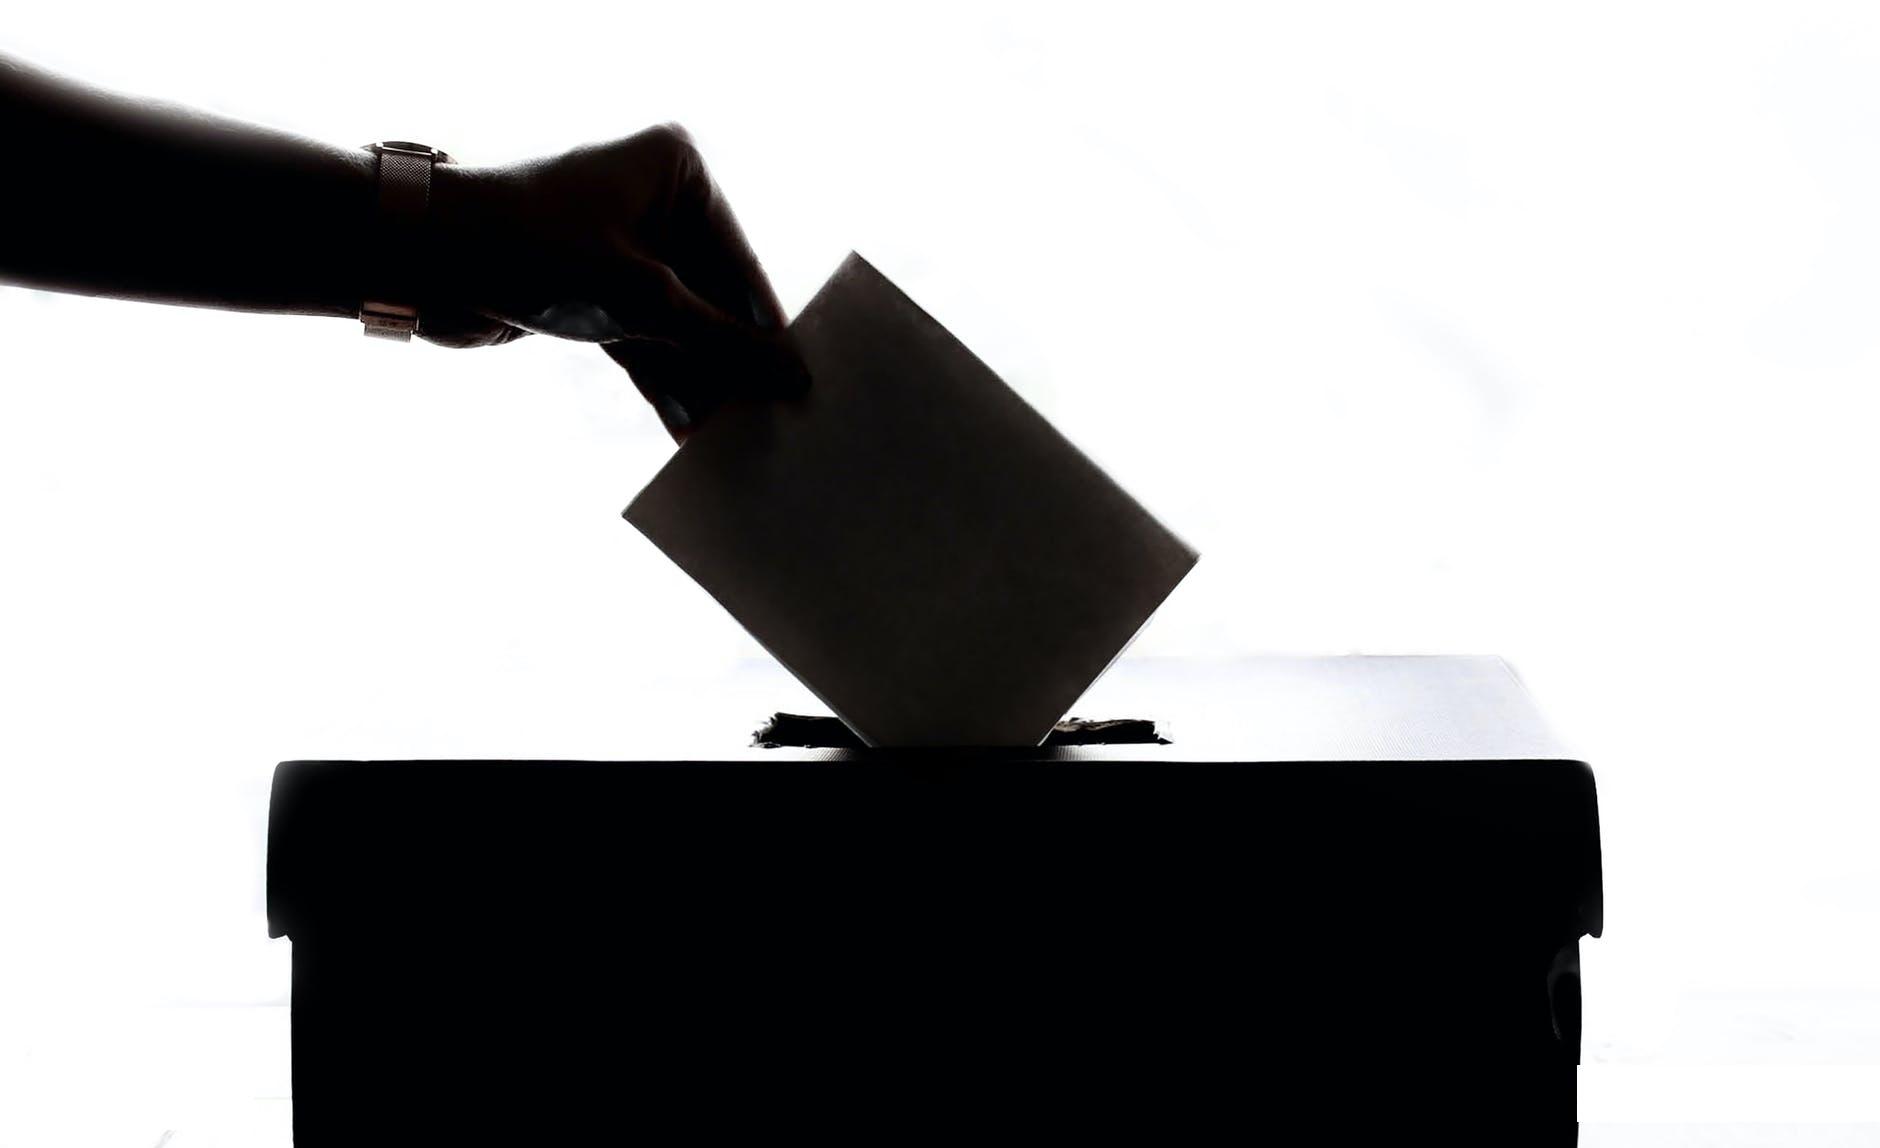 Vin alegerile. Ce vrem de la politicienii nostri?